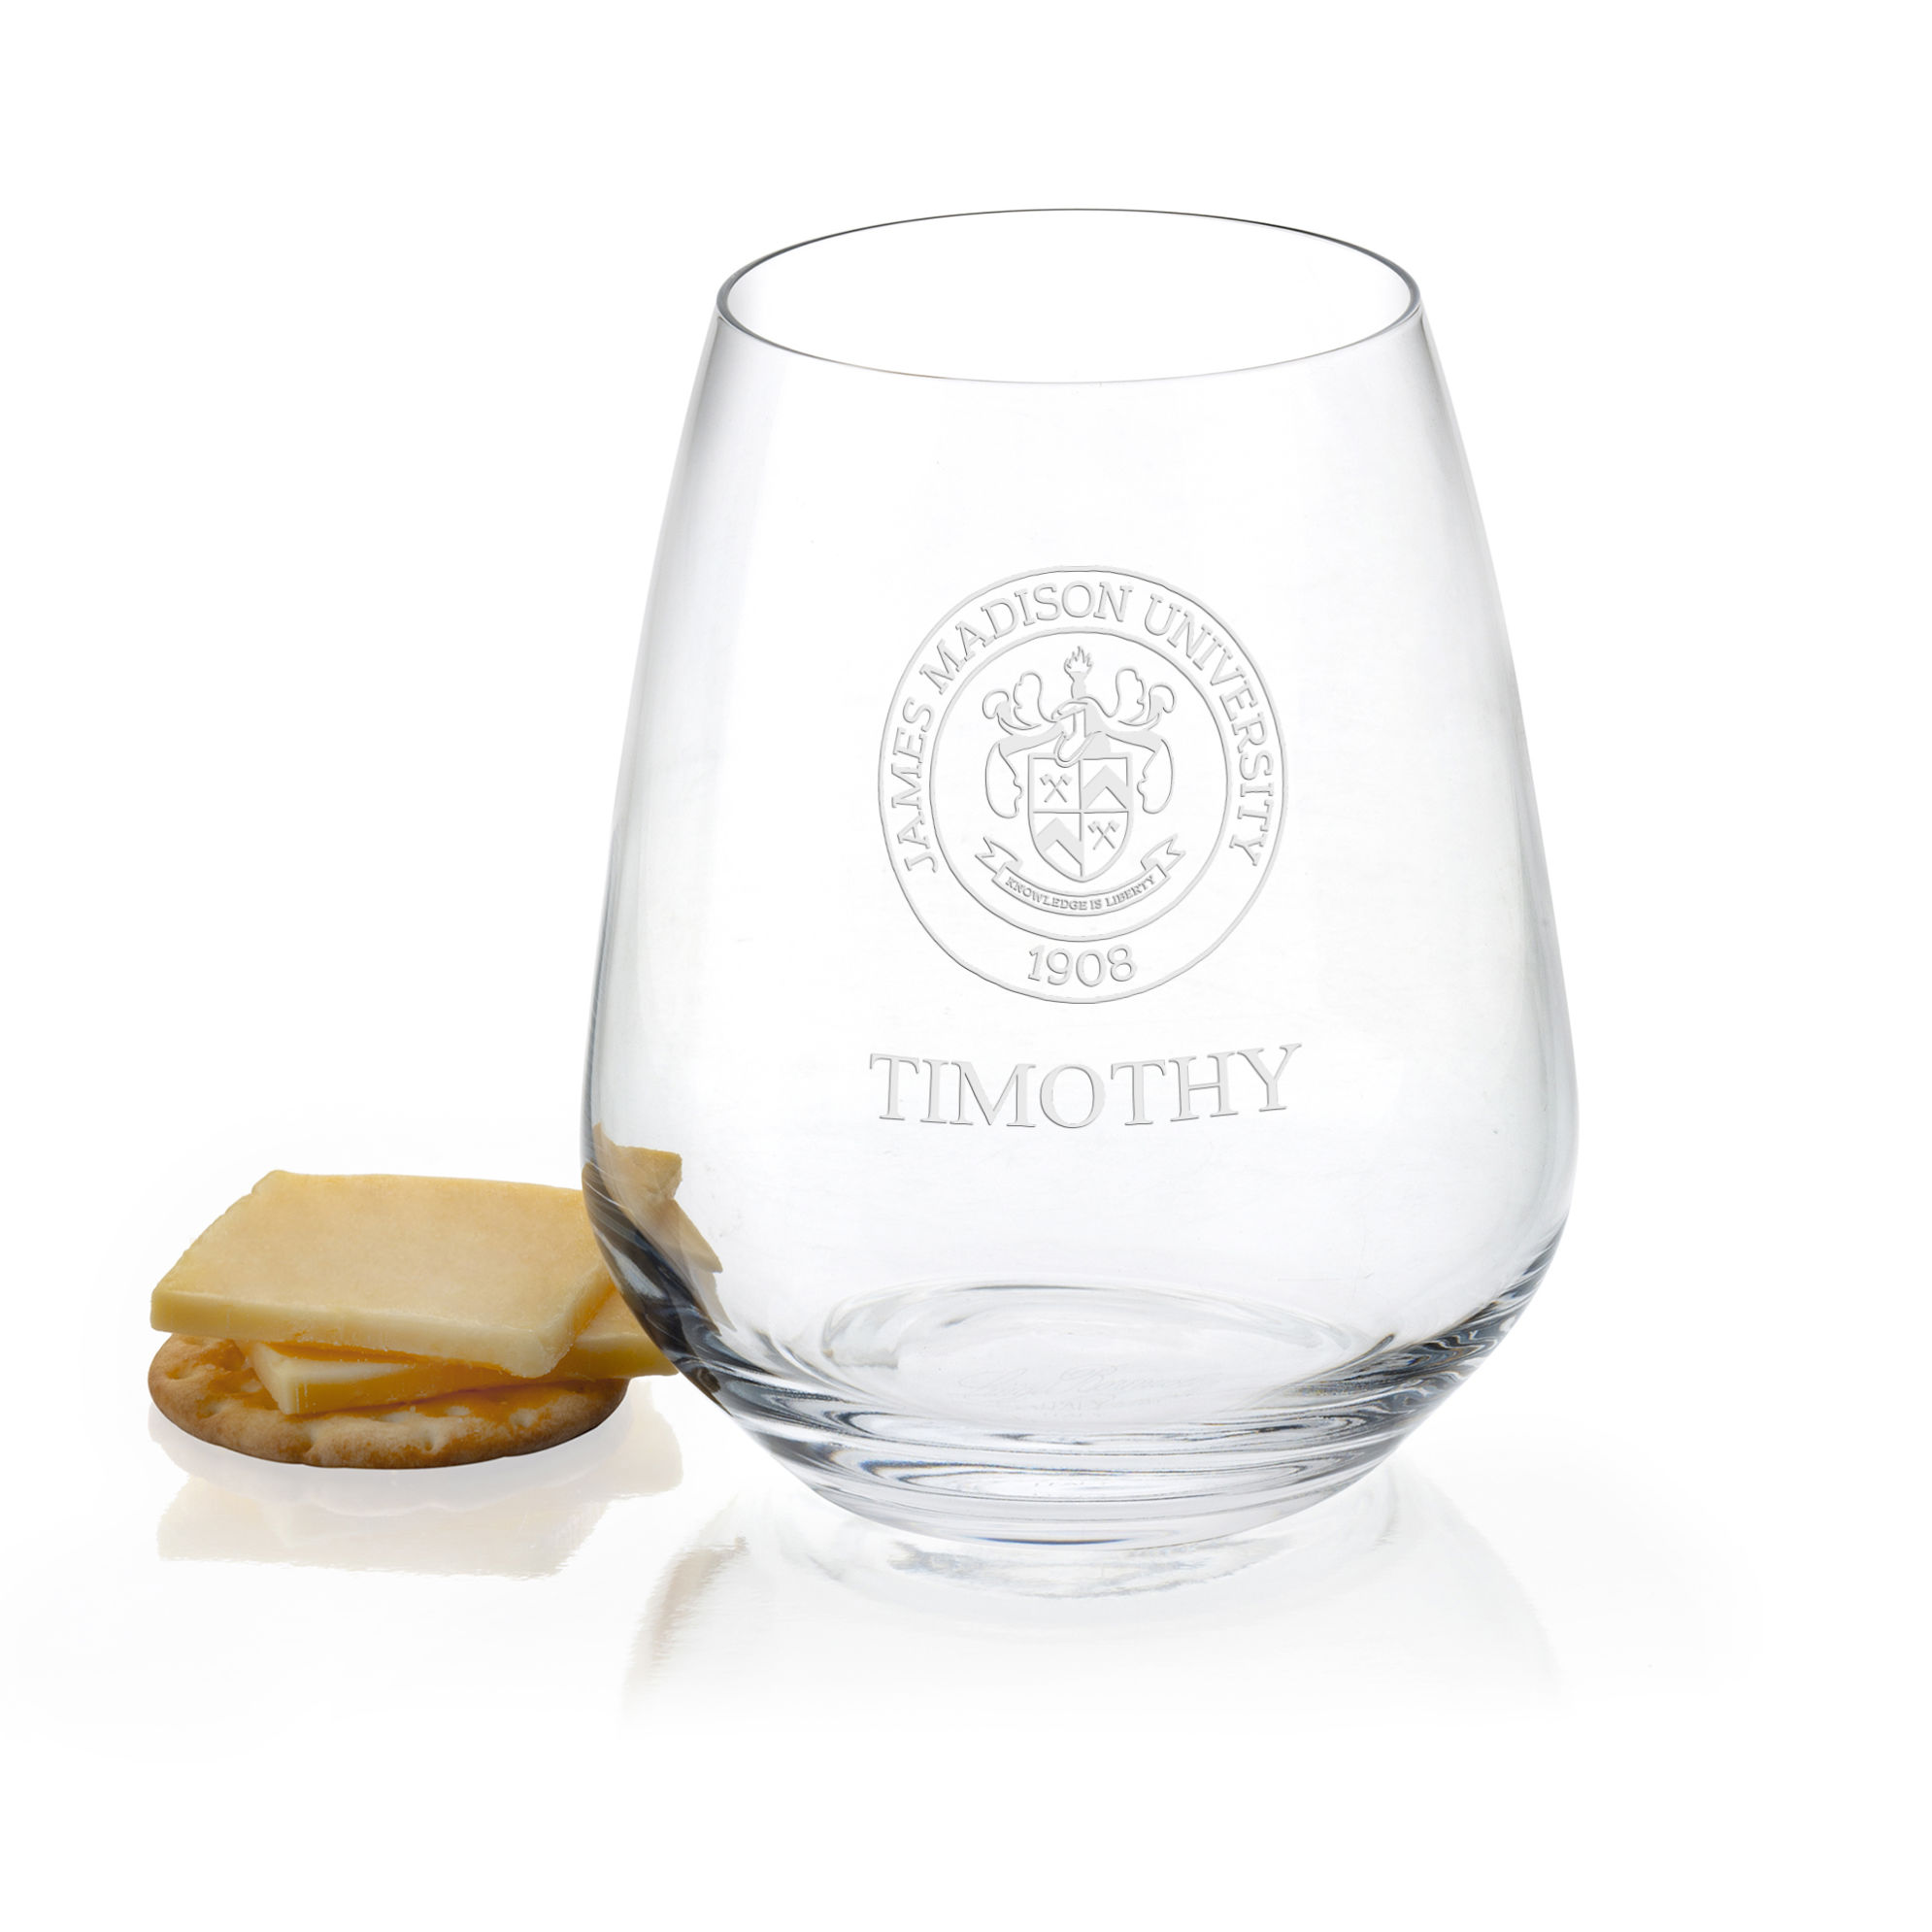 James Madison University Stemless Wine Glasses - Set of 4